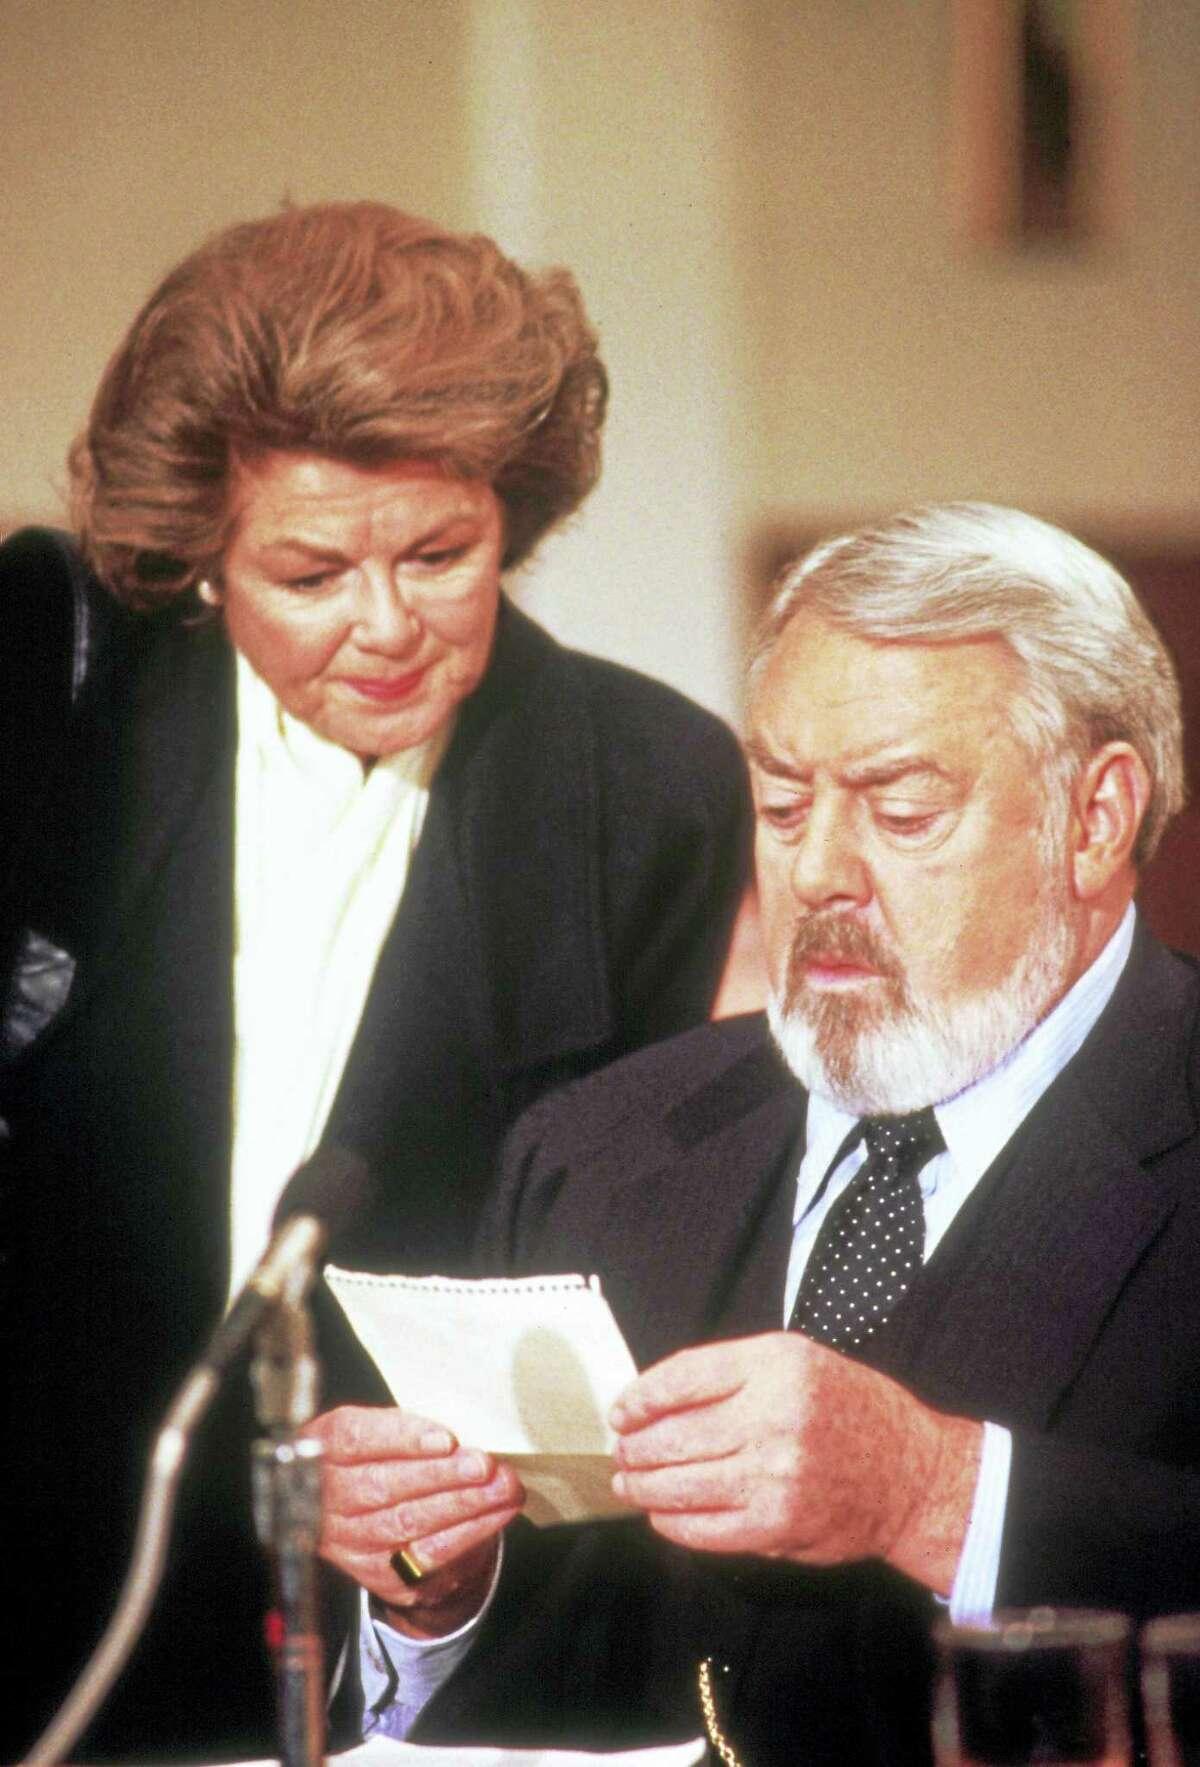 Barbara Hale, who played Della Street on Perry Mason